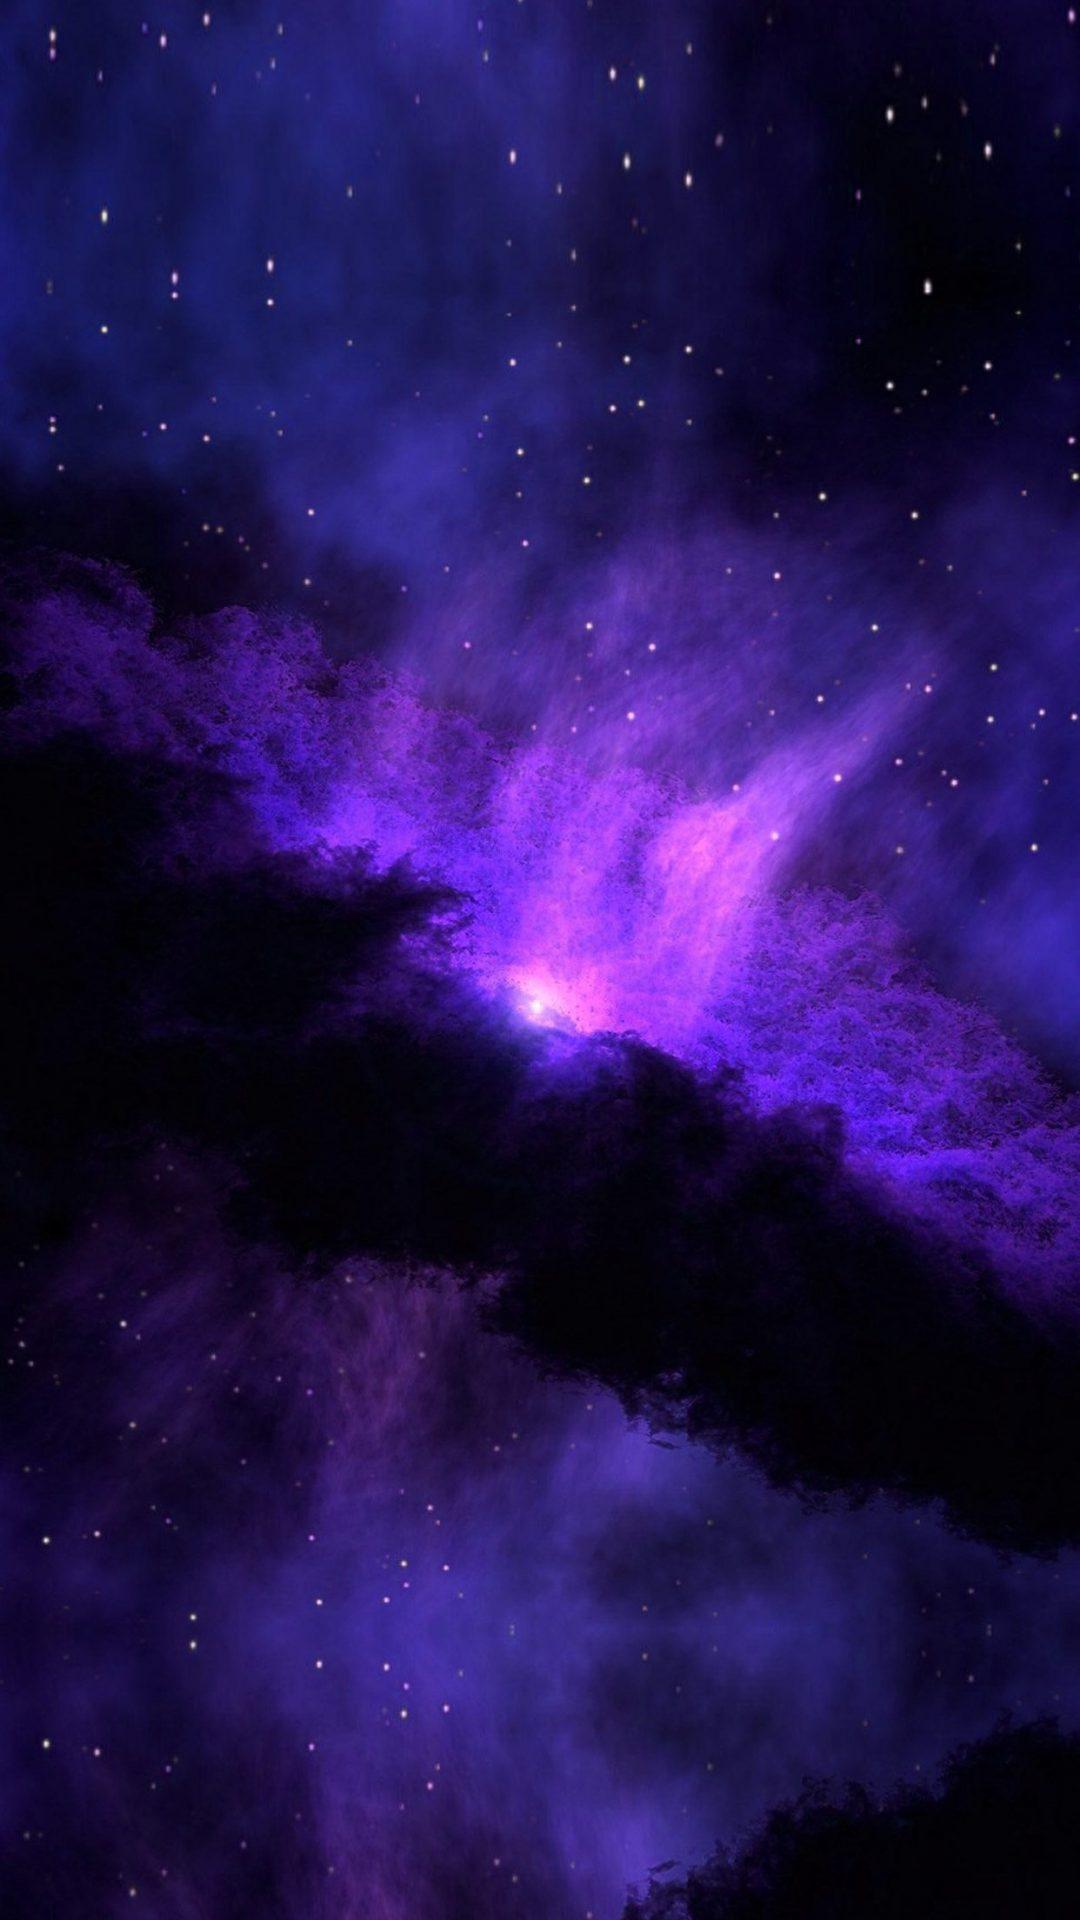 Space Blue Nebula Star Awesome